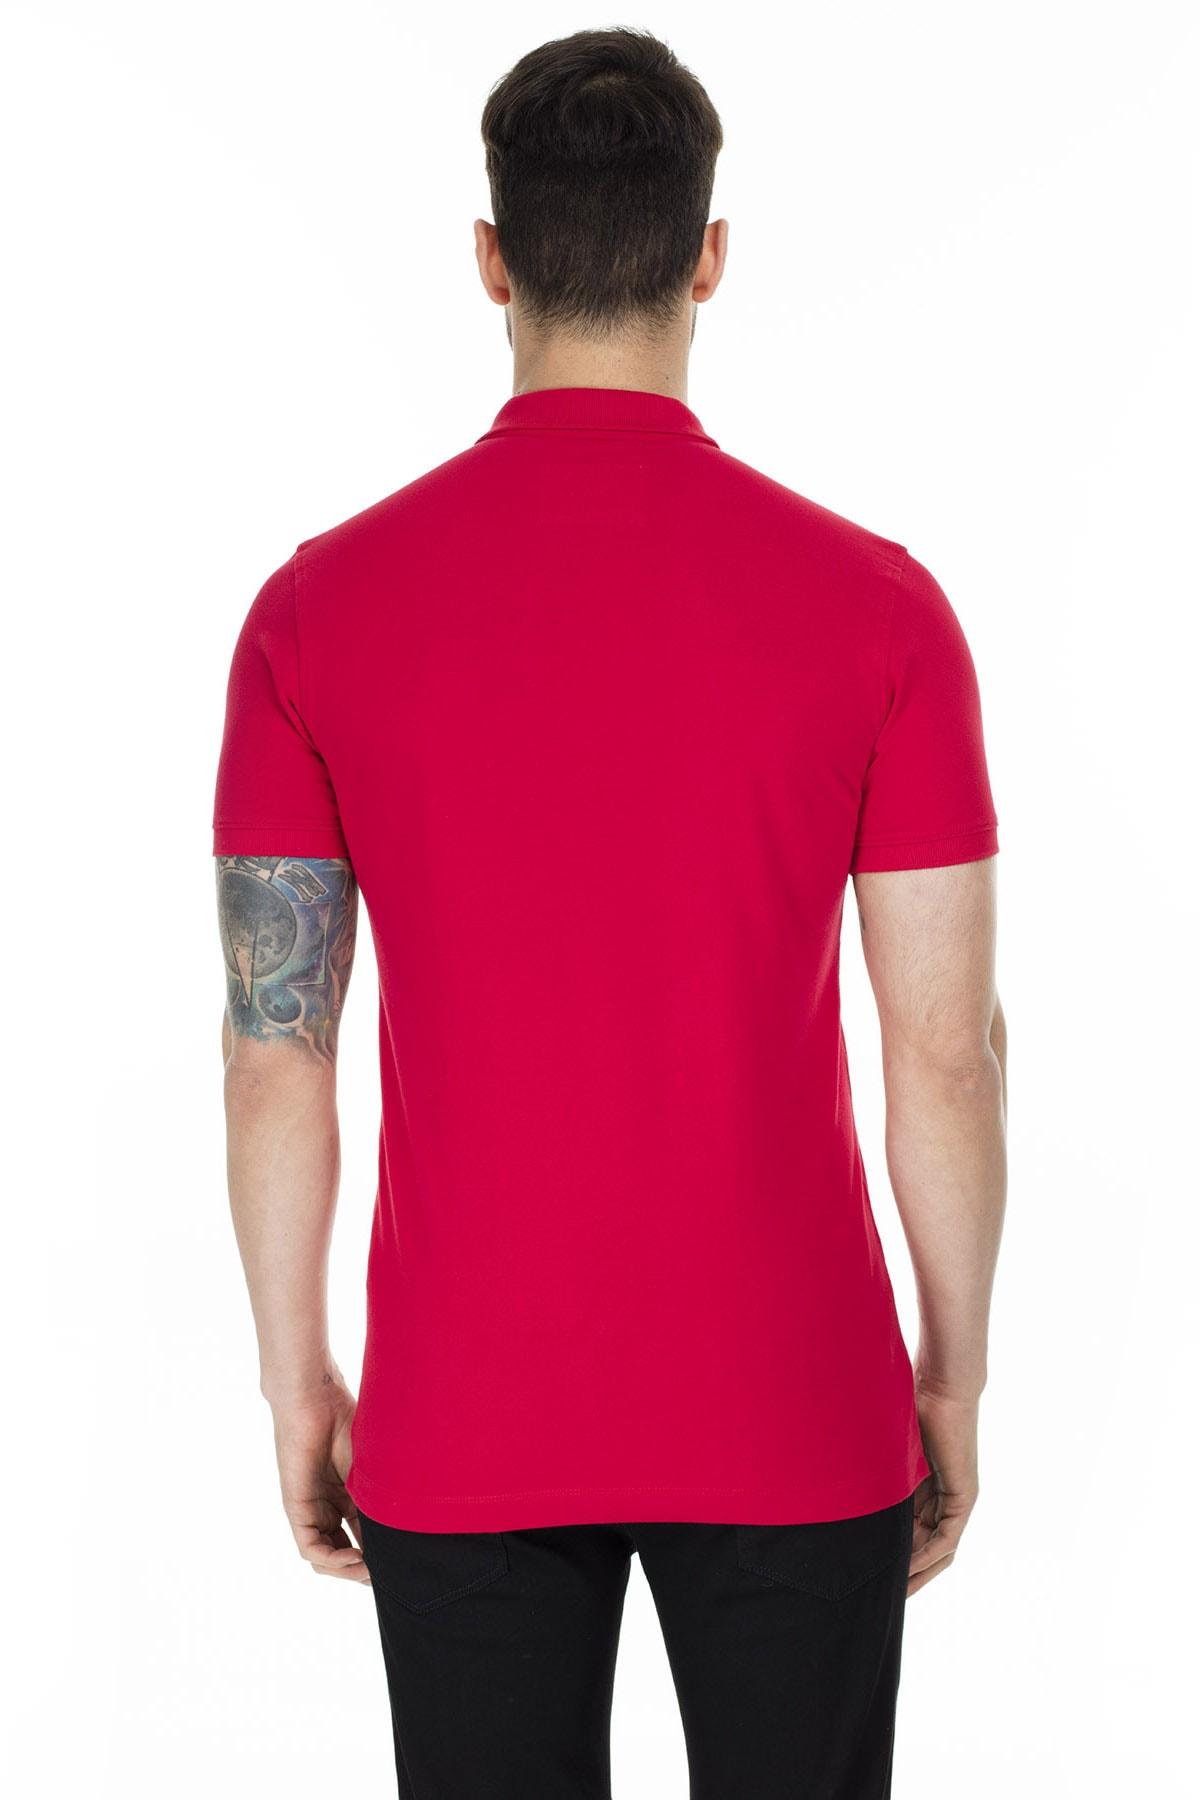 Lufian Laon Spor Polo T- Shirt Kırmızı 1